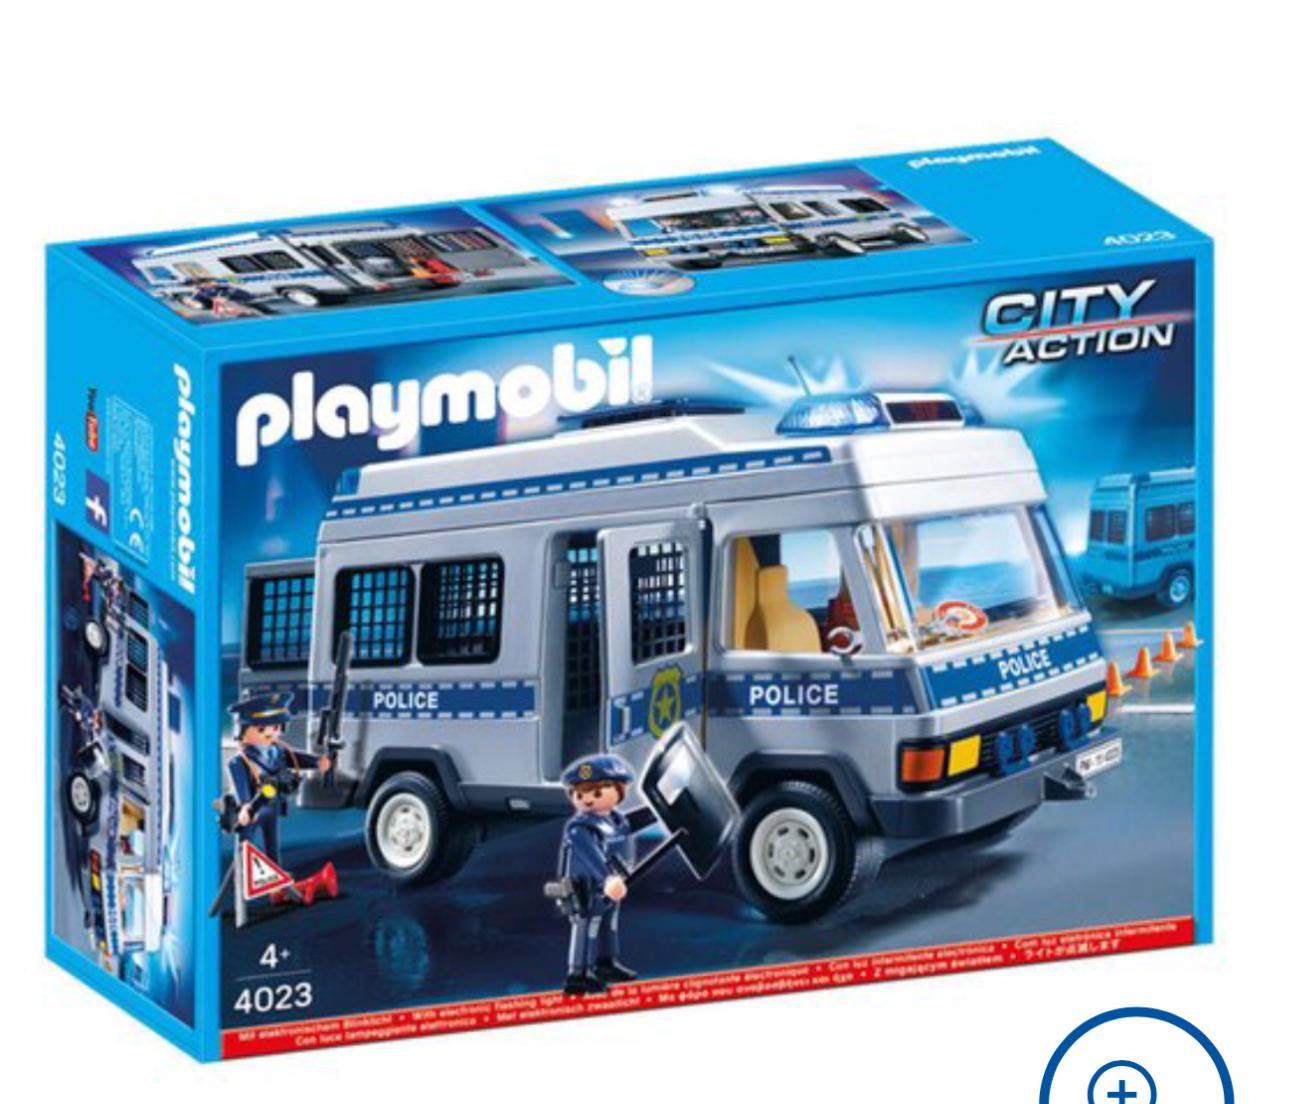 Playmobil Police Van @ Tesco - £20